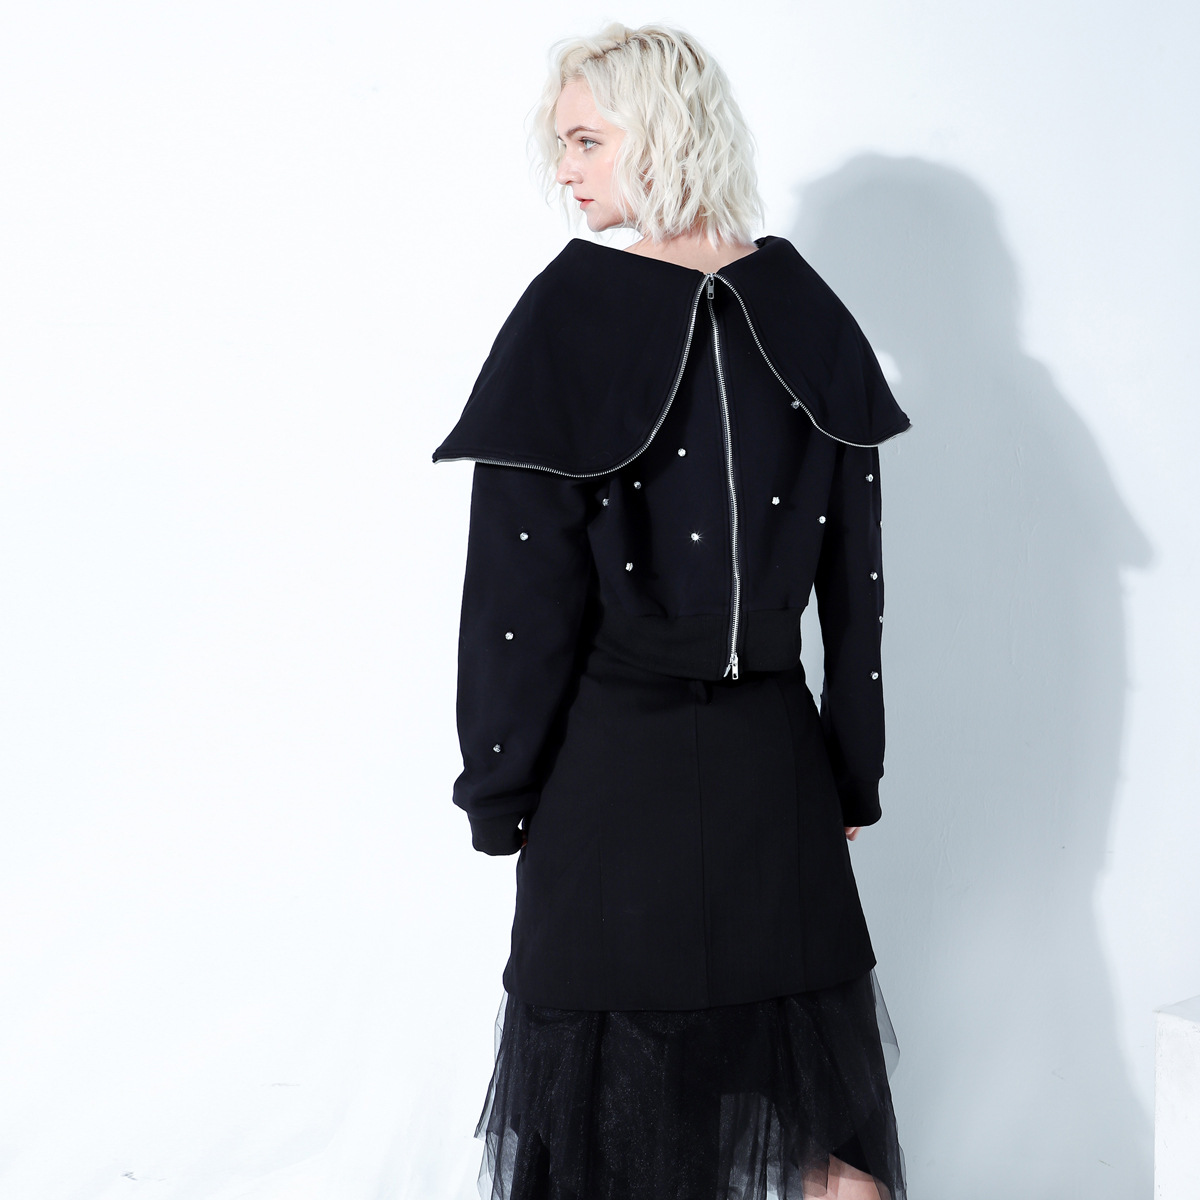 Cakucool Harajuku Streetwear sweat-shirt grand col rabattu sweats à capuche zippés décontracté perles deux façons porter survêtement haut Femme